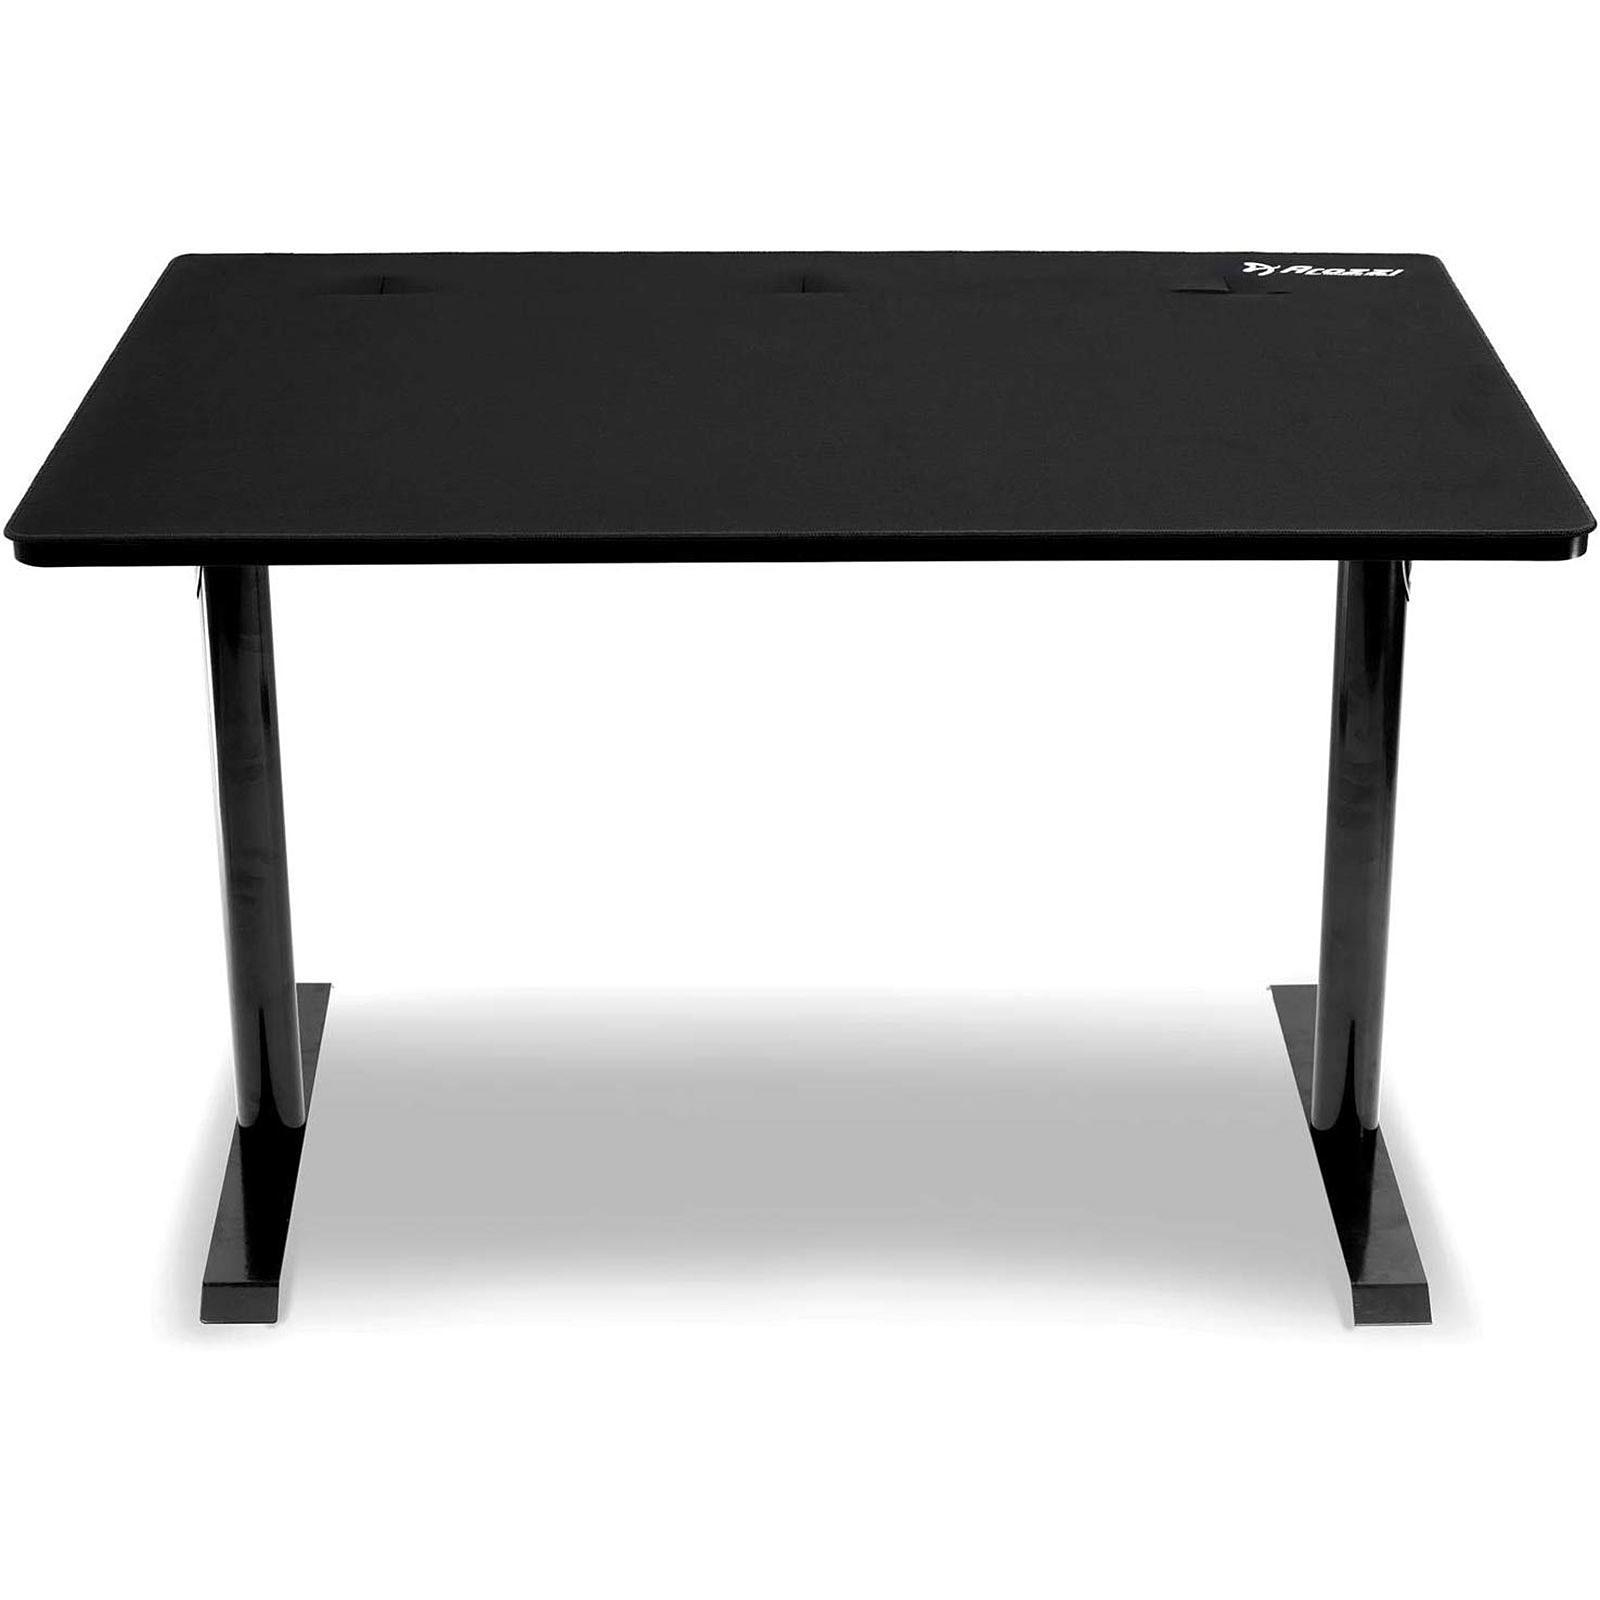 Arozzi arena leggero noir meuble ordinateur arozzi sur - Meuble ordinateur ...